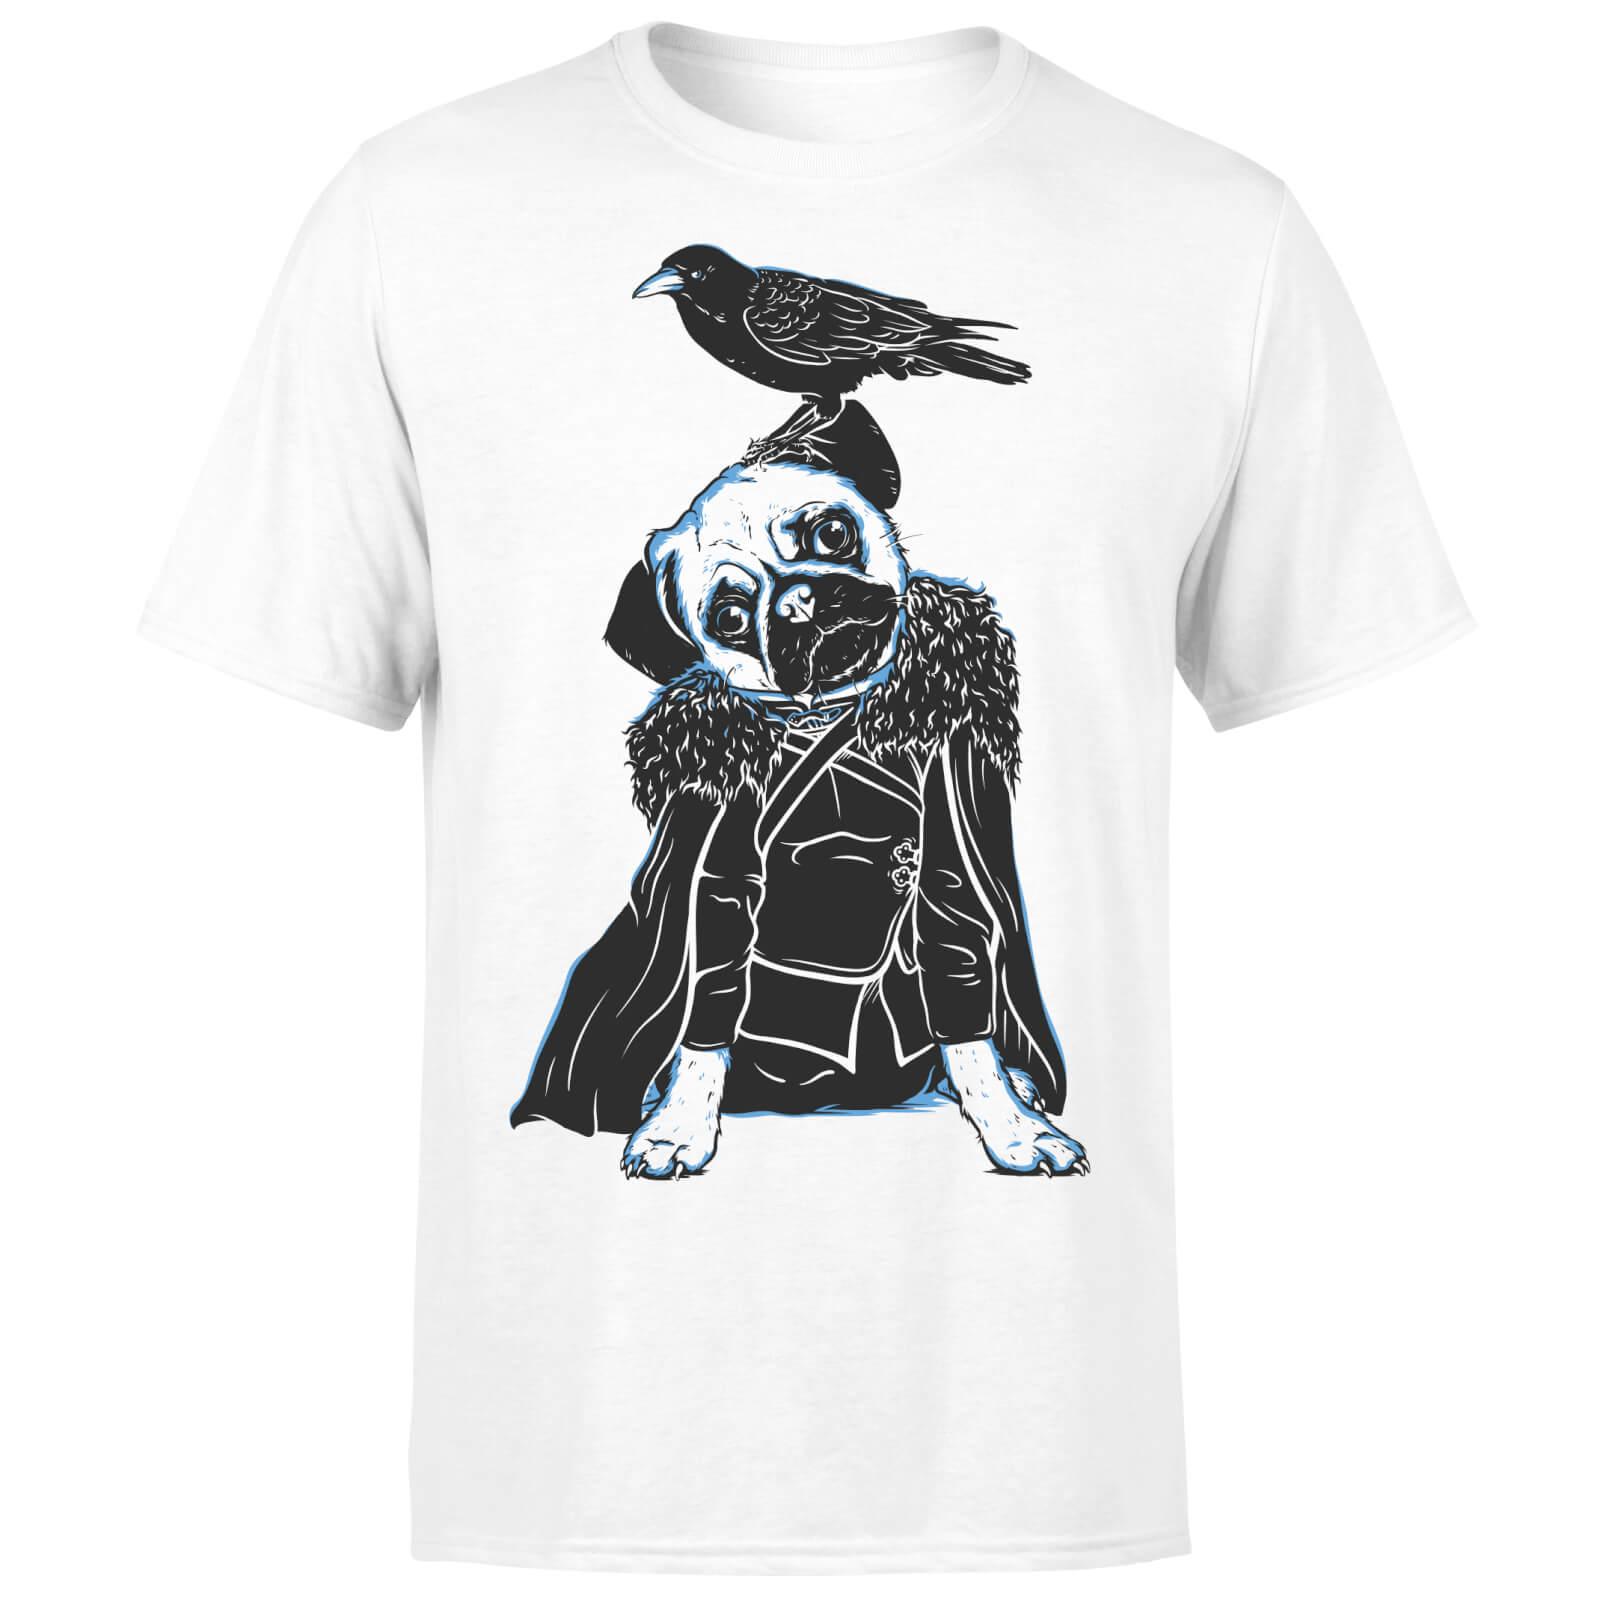 T-Junkie Pug In The Snow Men's White T-Shirt - L - White